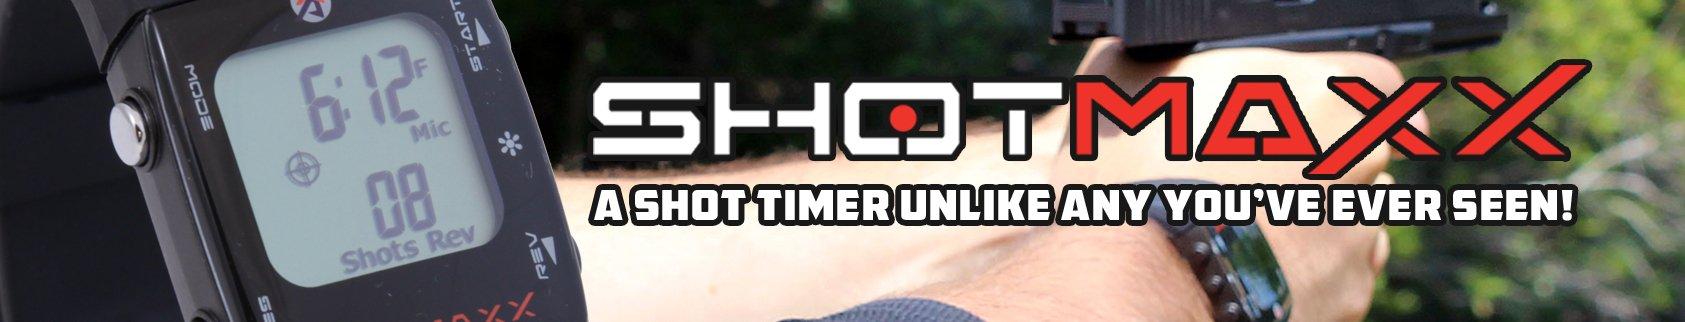 SHOTMAXX Timers